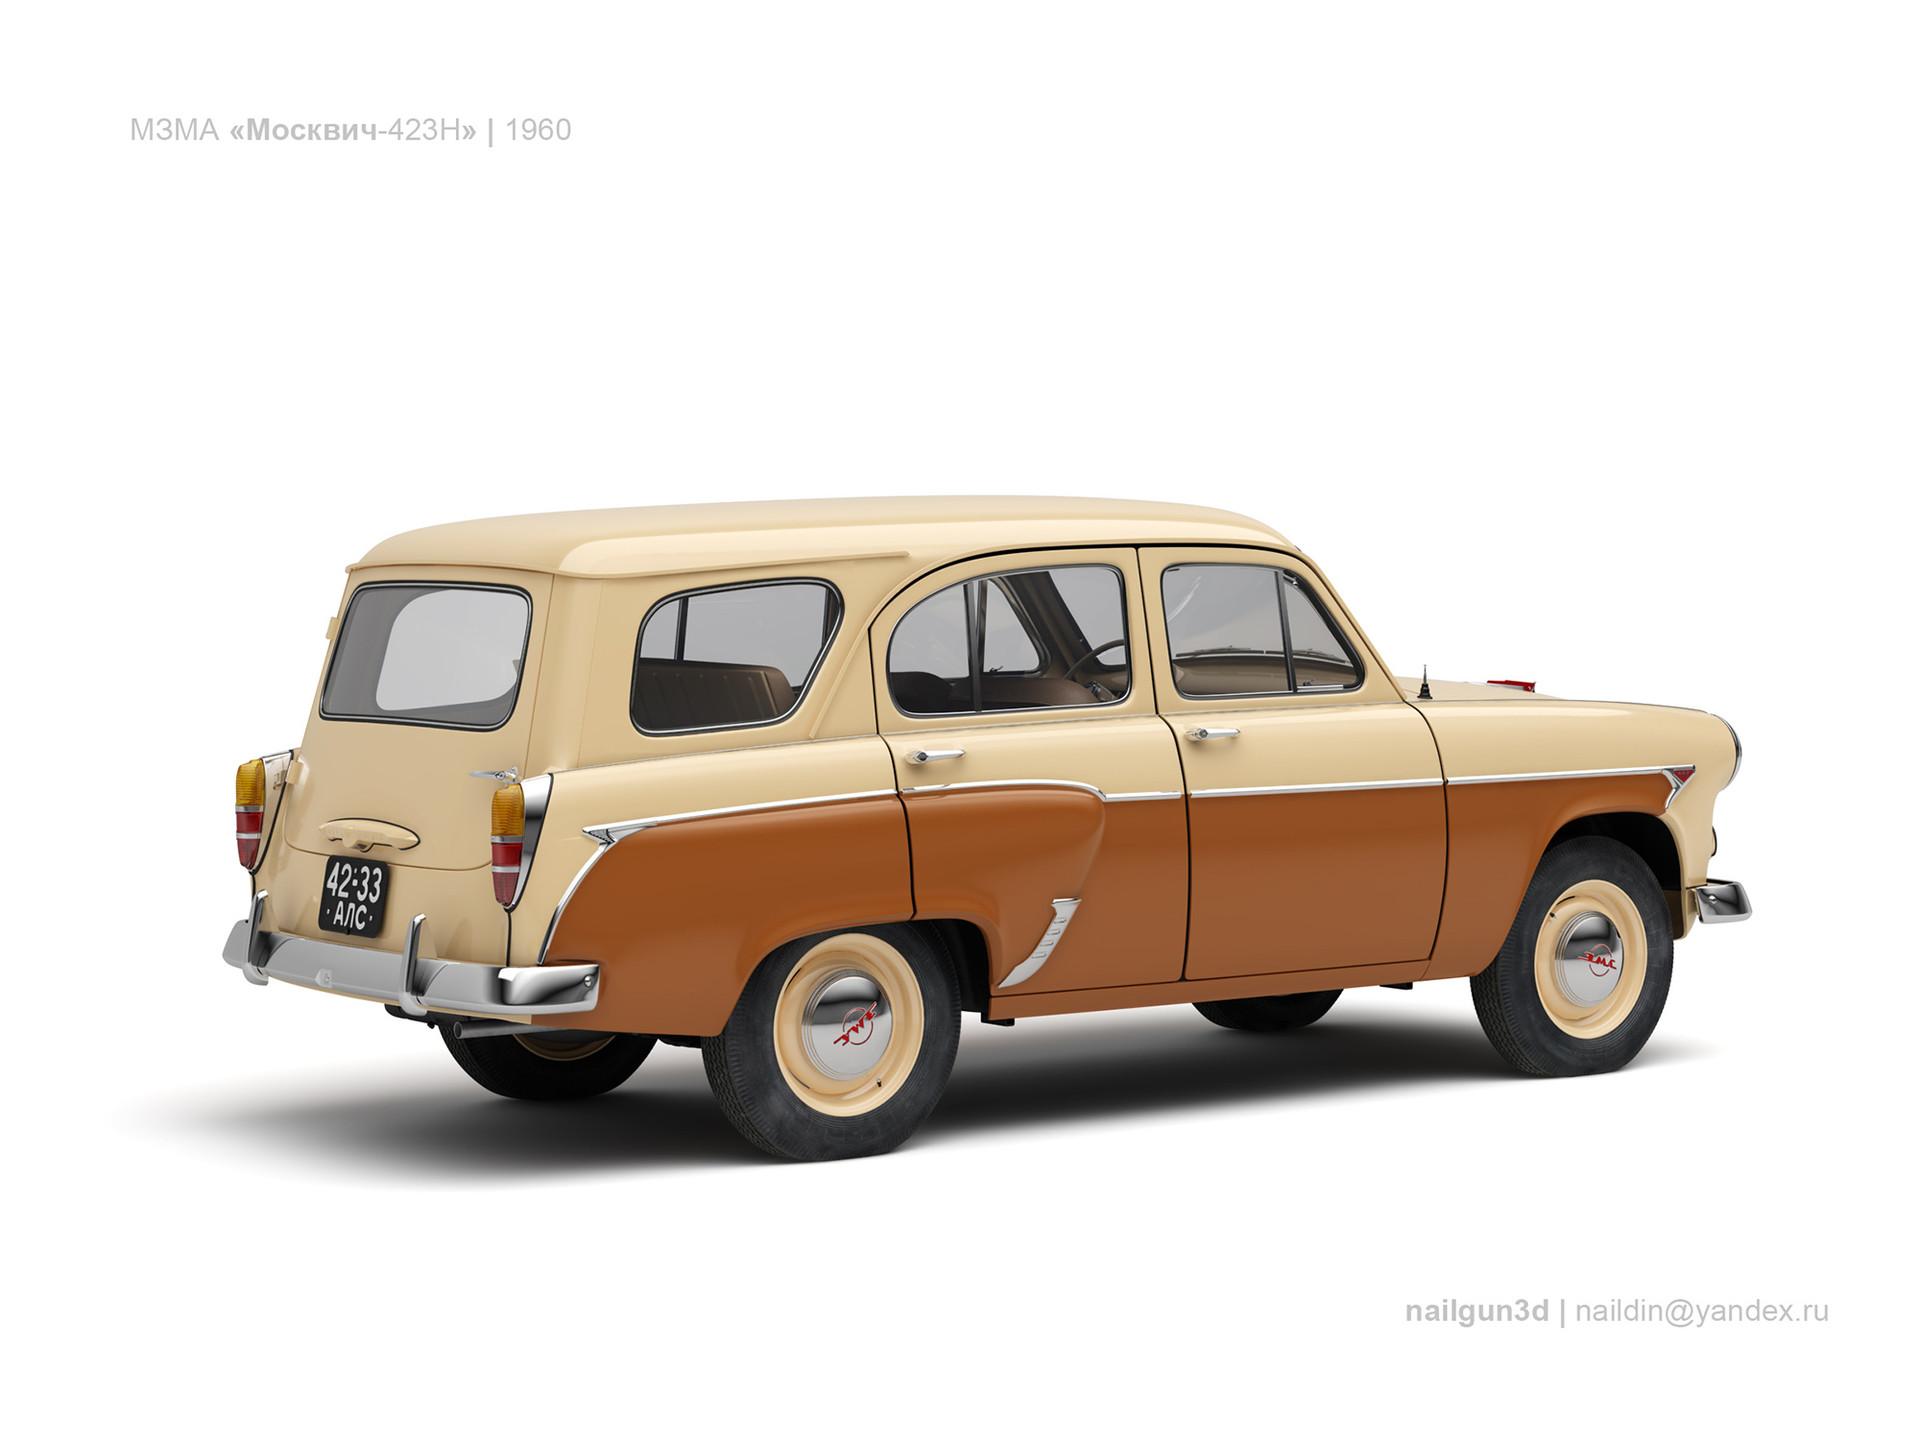 Nail khusnutdinov ussr moskvich 423n 1960 1